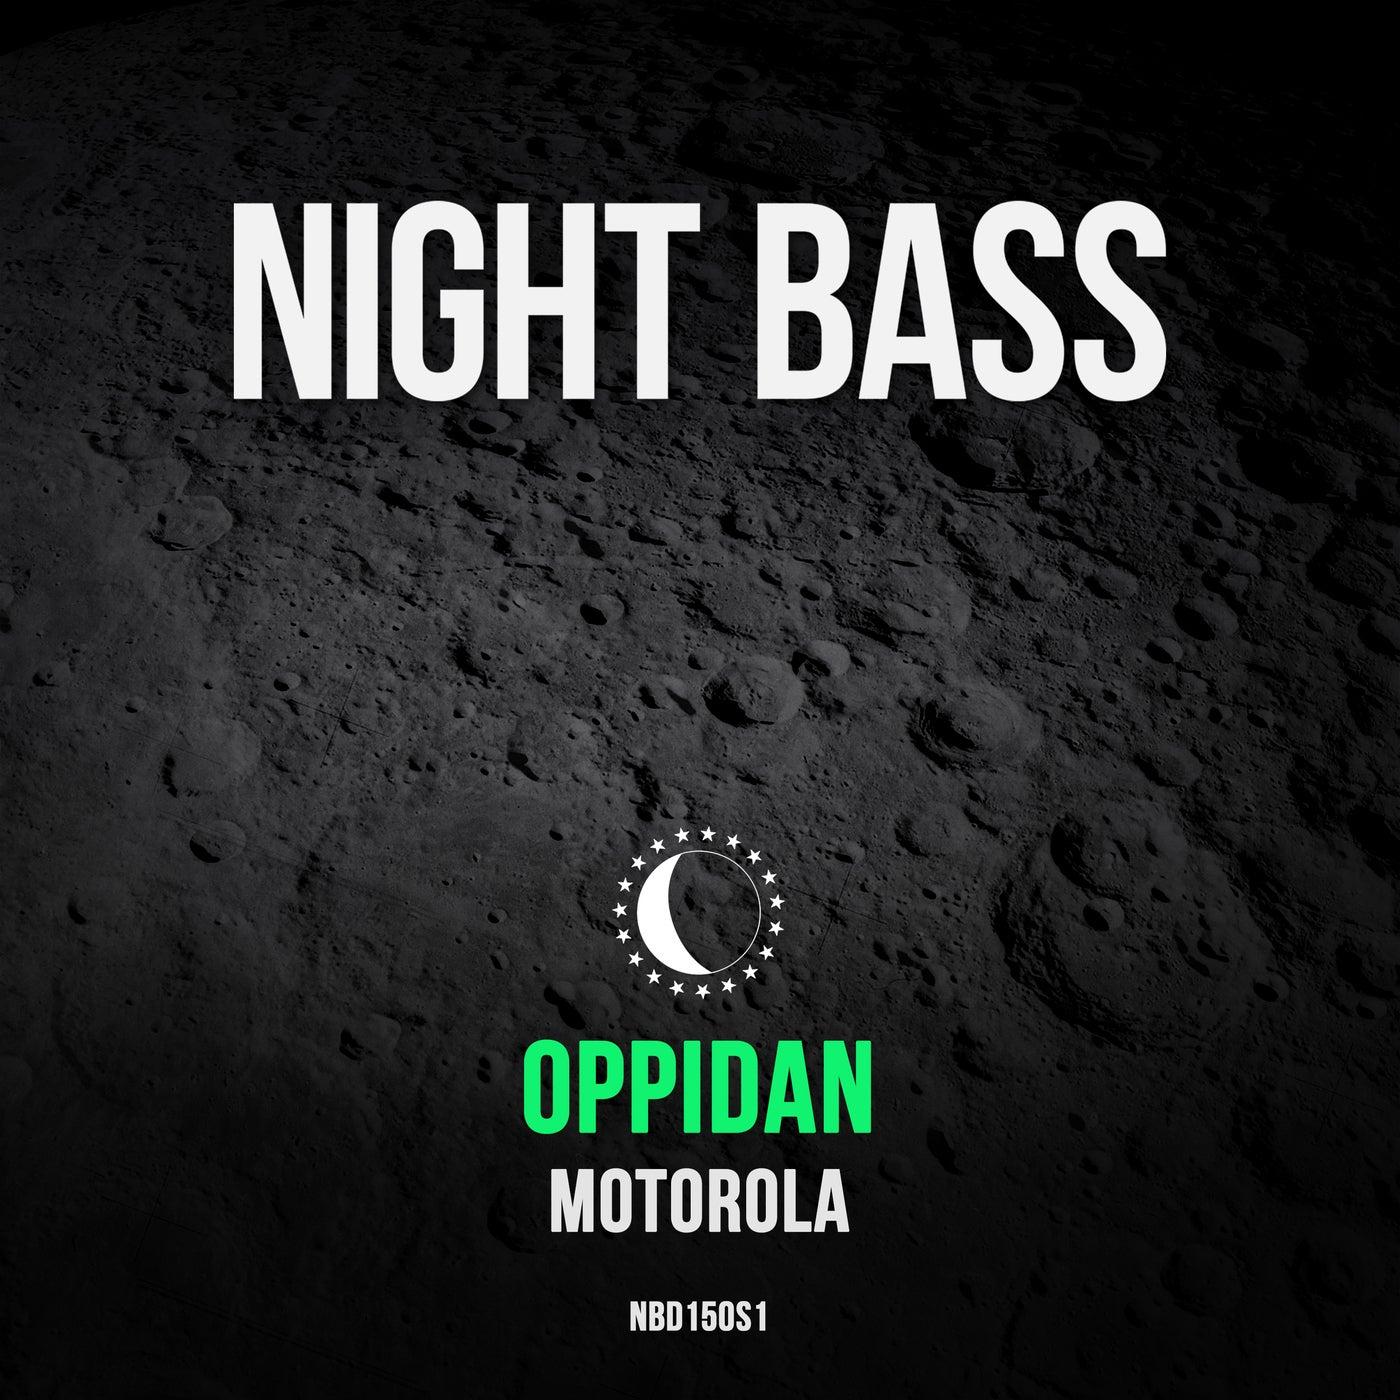 Motorola (Original Mix)